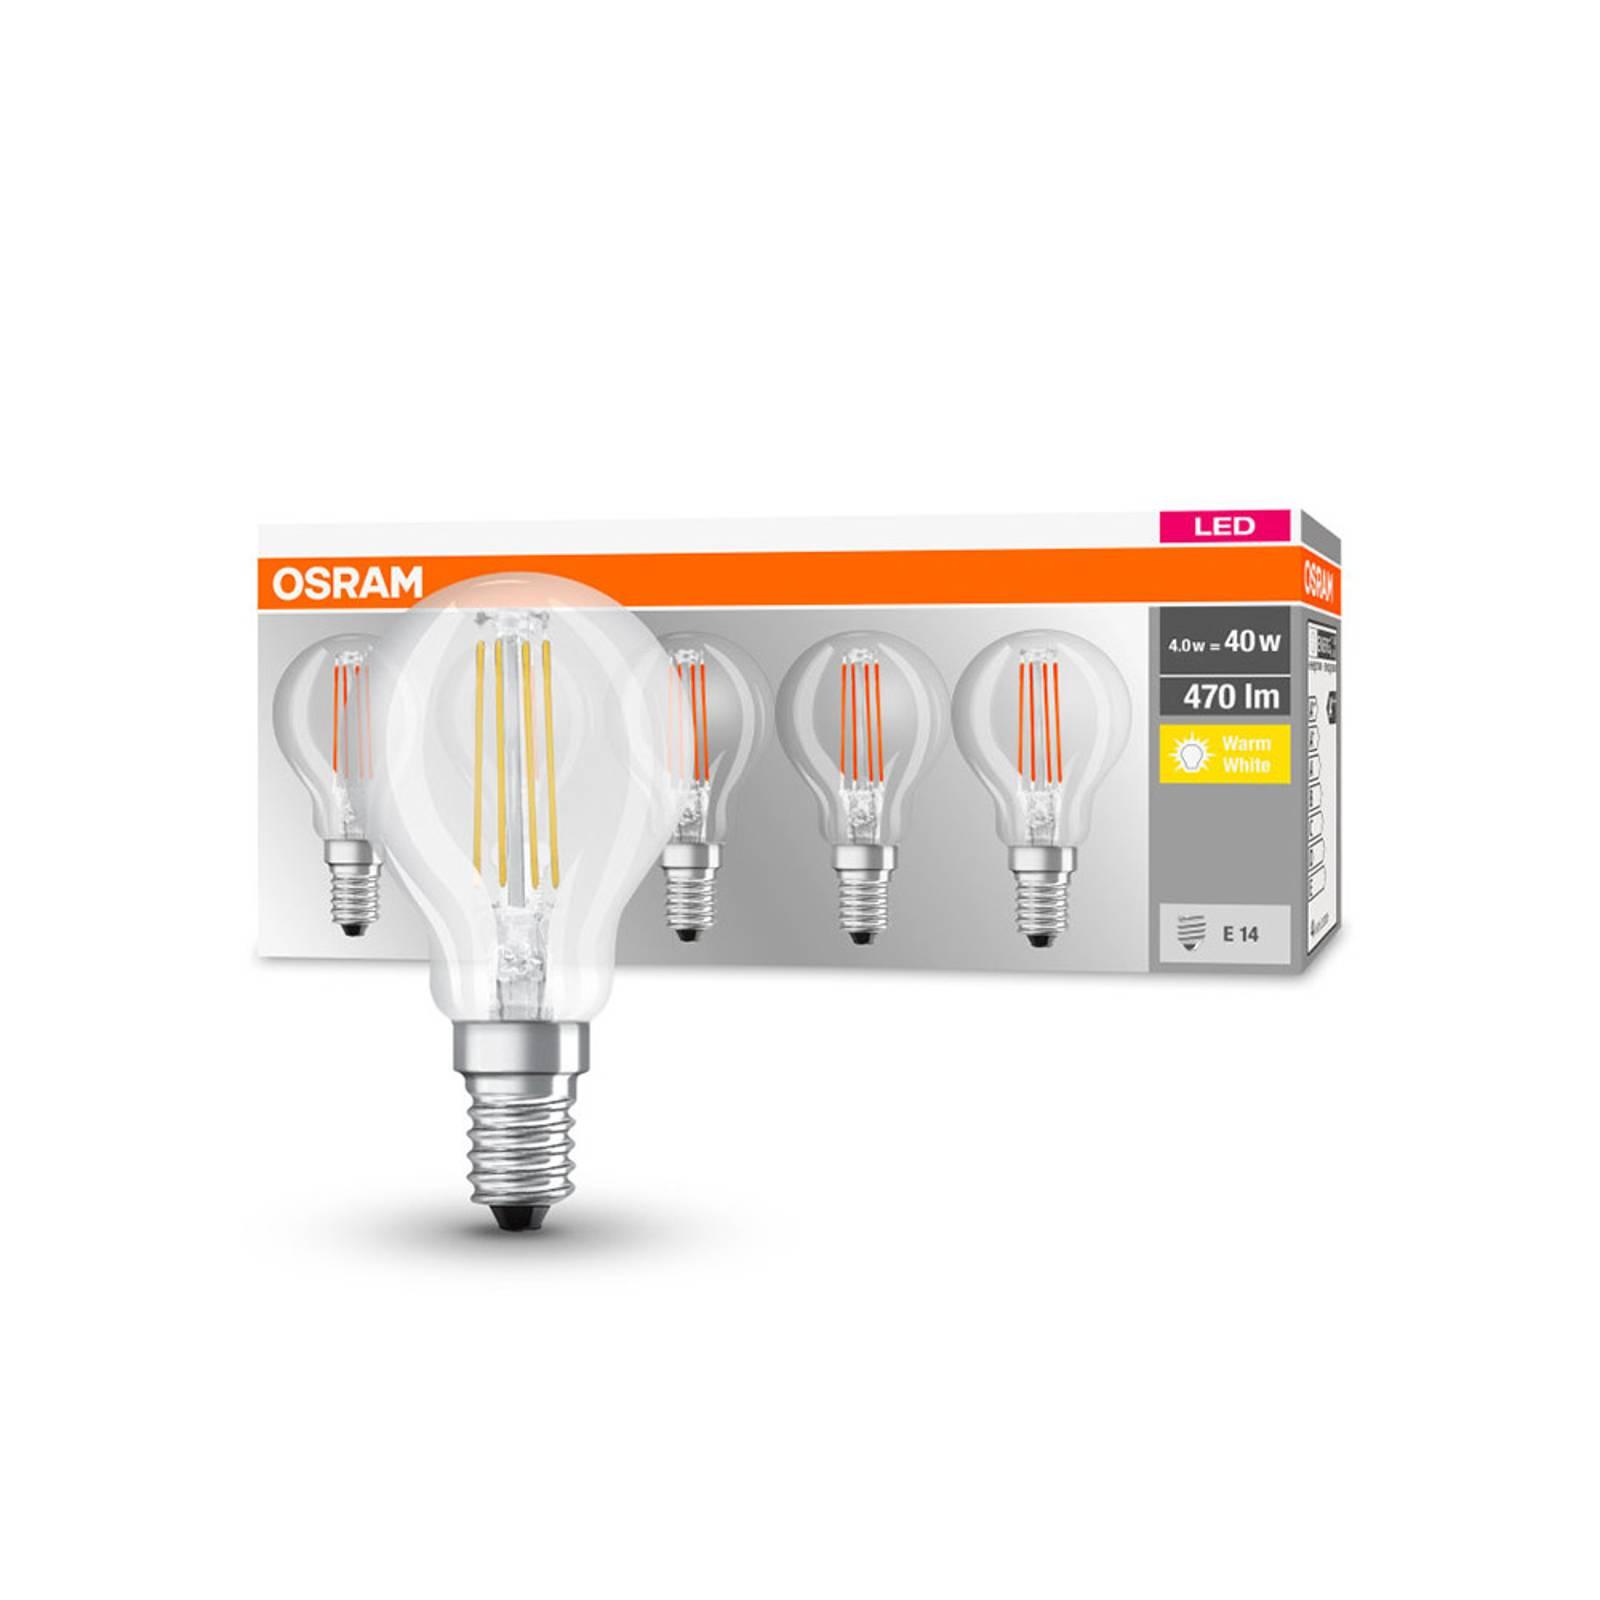 OSRAM-LED-lamppu E14 P40 4W Filament 827 470lm, 5